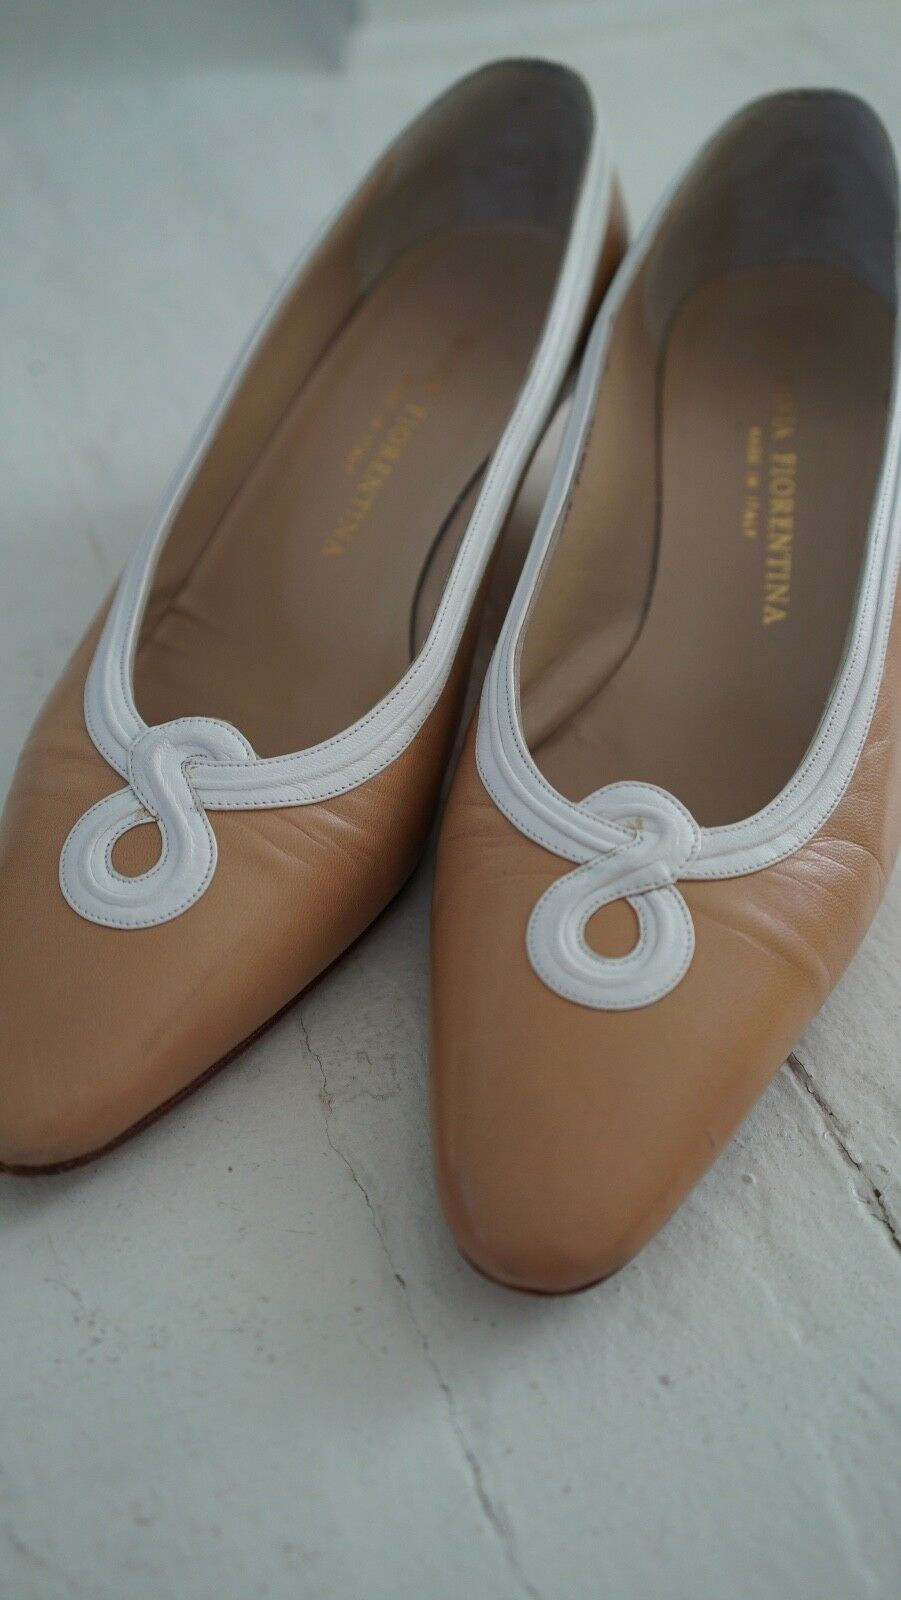 Silvia fiorentina beige pumps pumps pumps white trim low heel fdc0cf